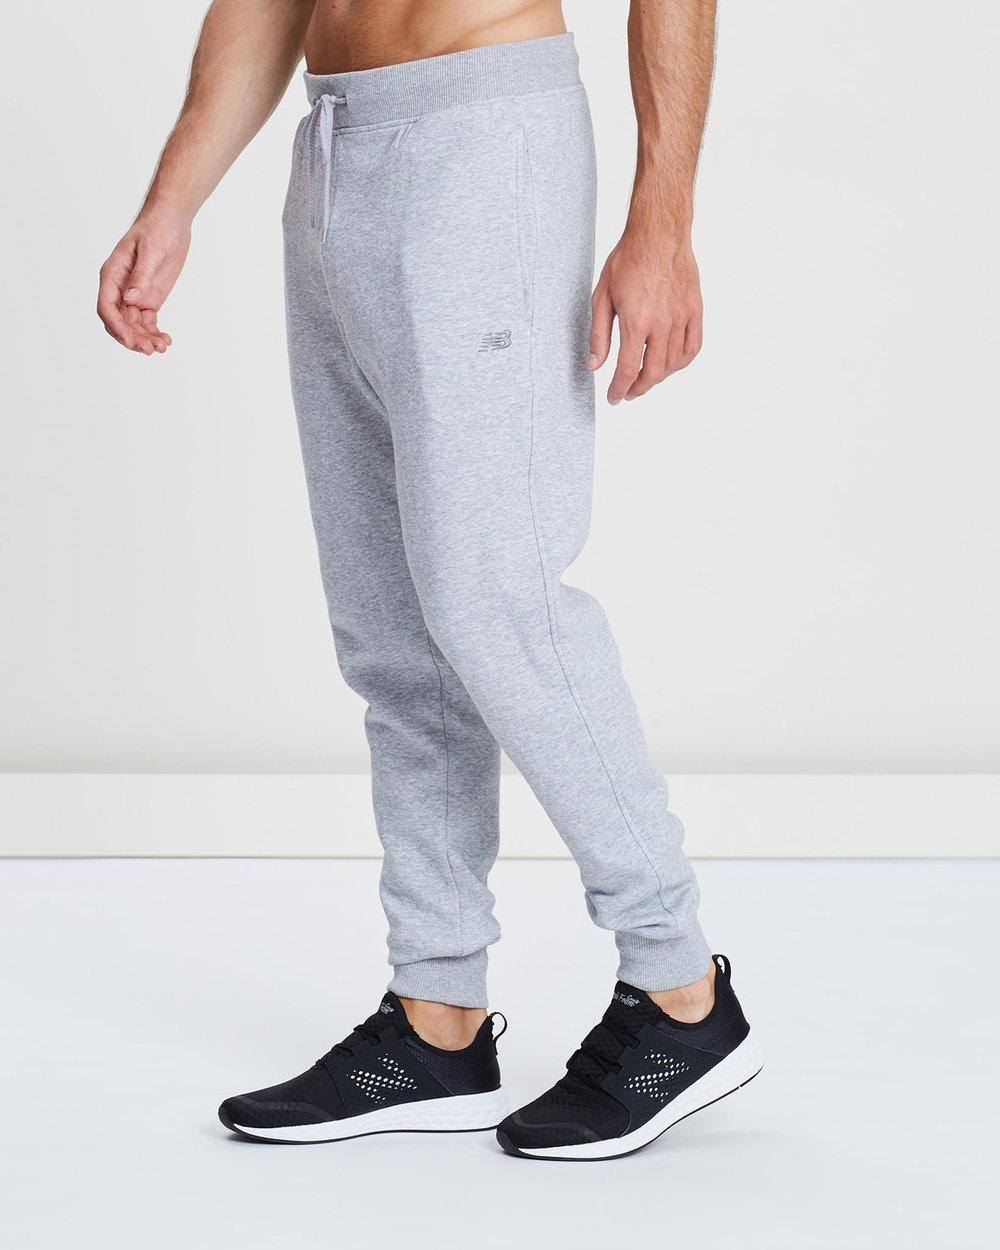 a09227e8abf40 Volume Fleece Pants by New Balance Online   THE ICONIC   Australia